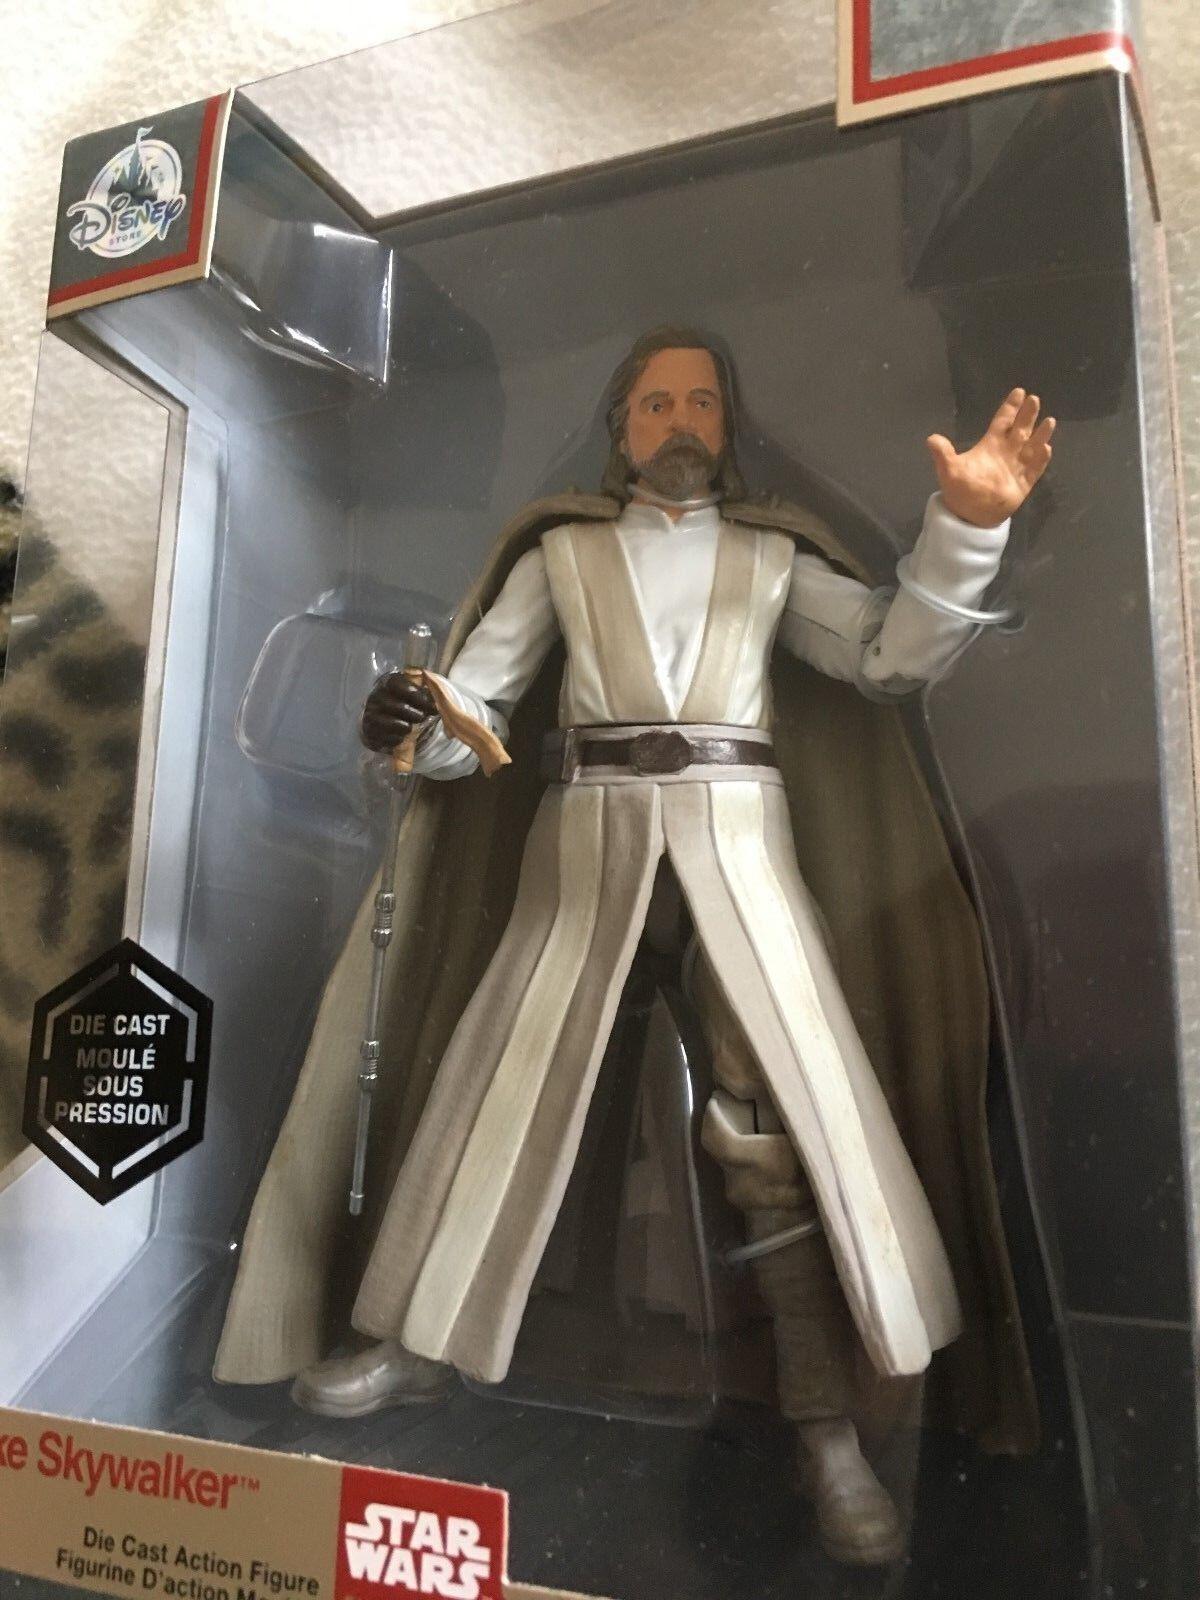 Star Wars    the last  jedi  elite series  luke skywalker   die-cast  figure